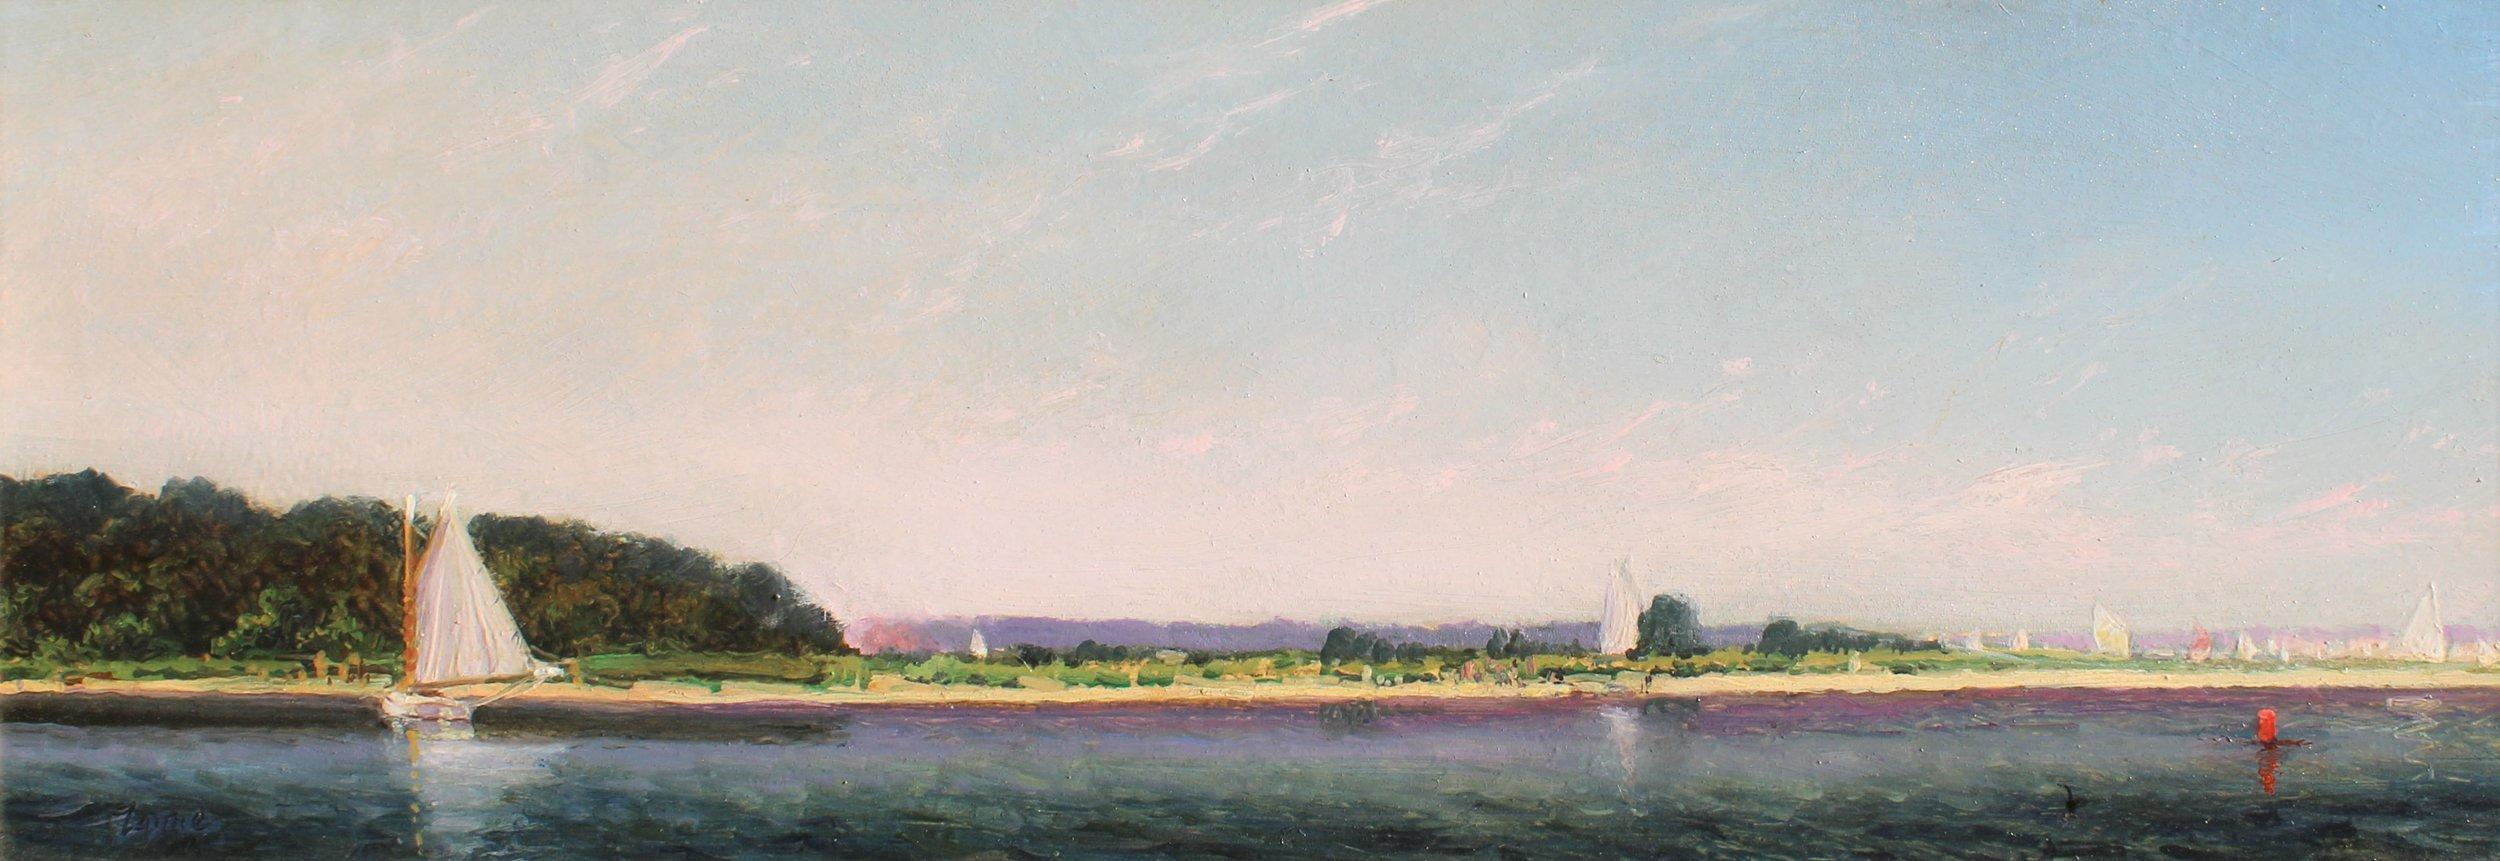 PETER ARGUIMBAU    Catboat Along the Shoreline    9 x 25 inches